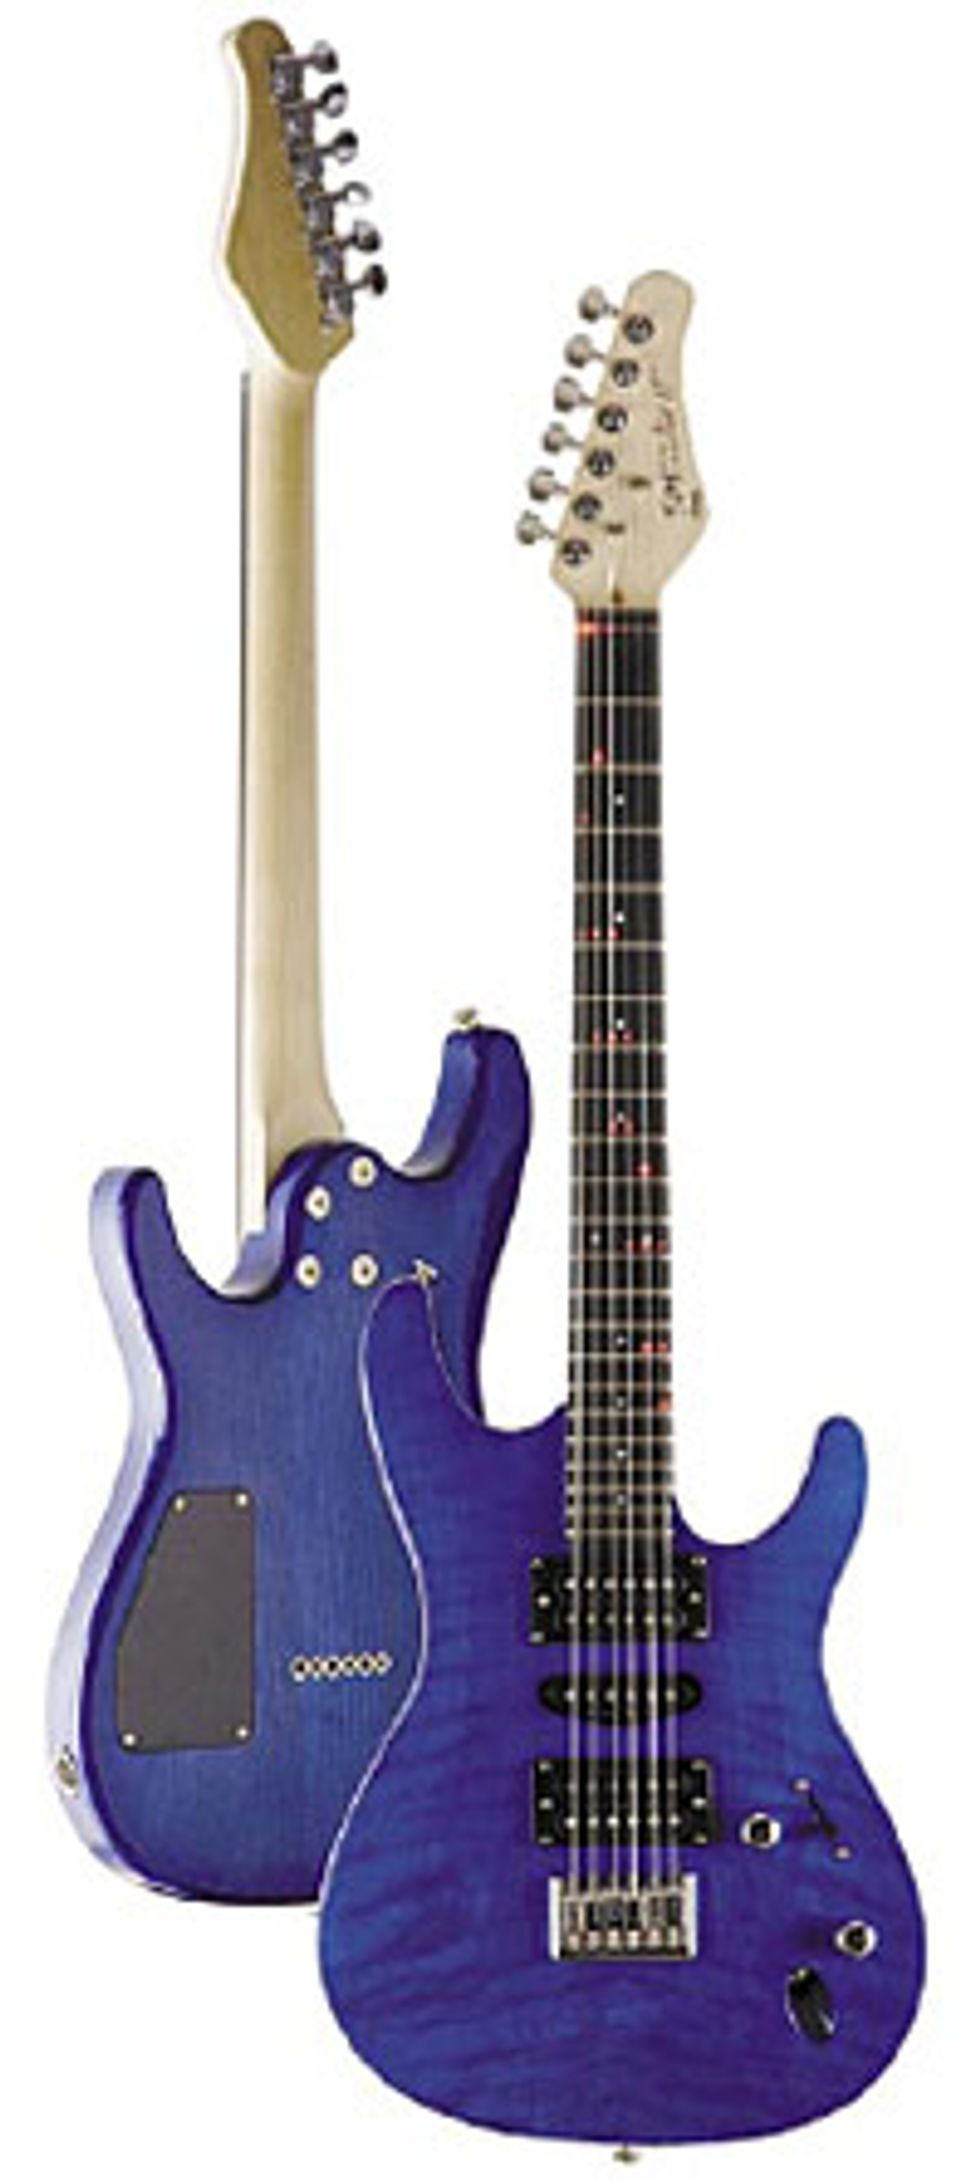 Fretlight FG-451 Pro Guitar